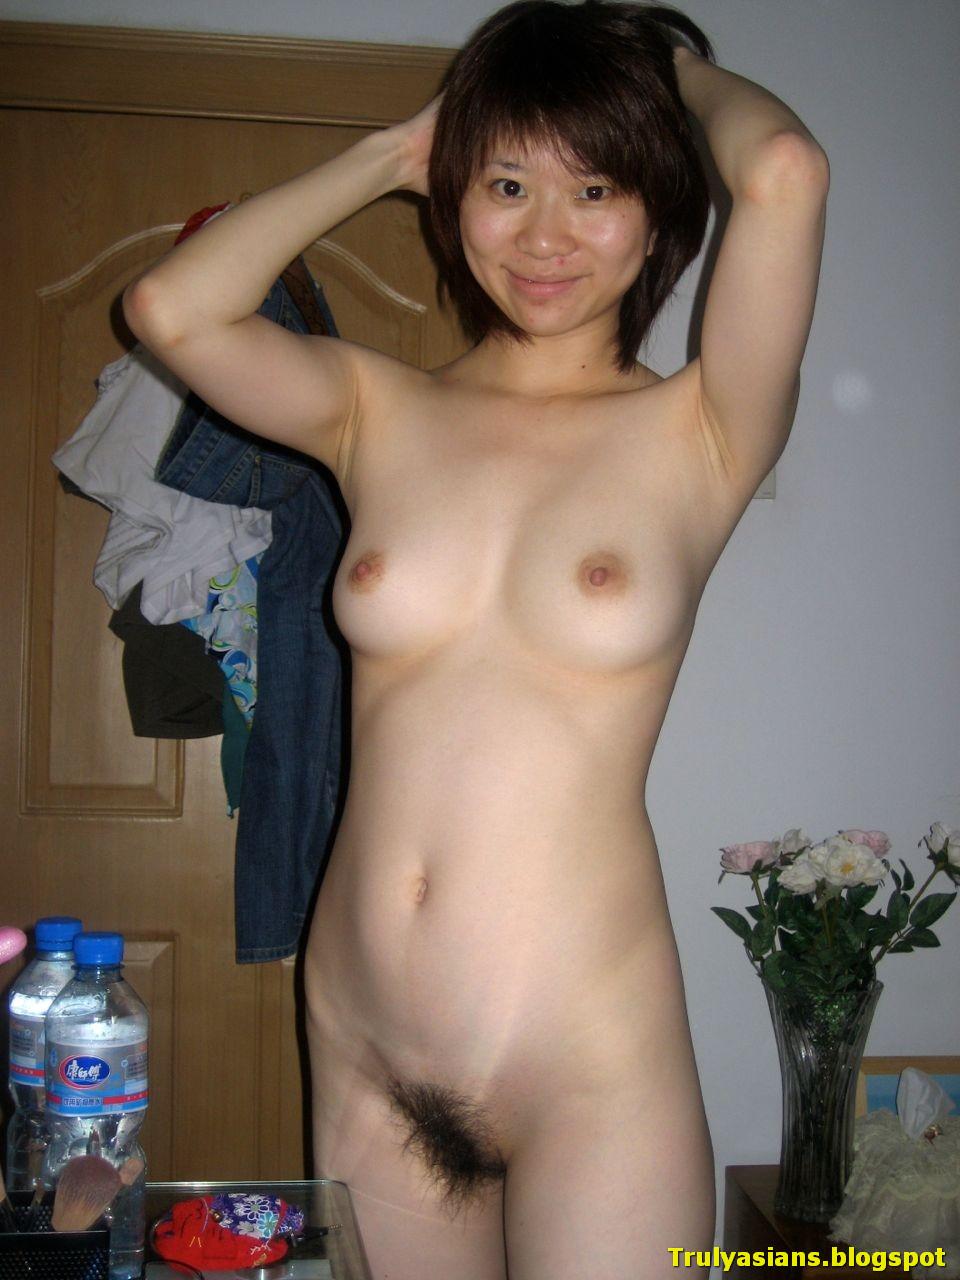 Chinese girls nude pitchers foto 134